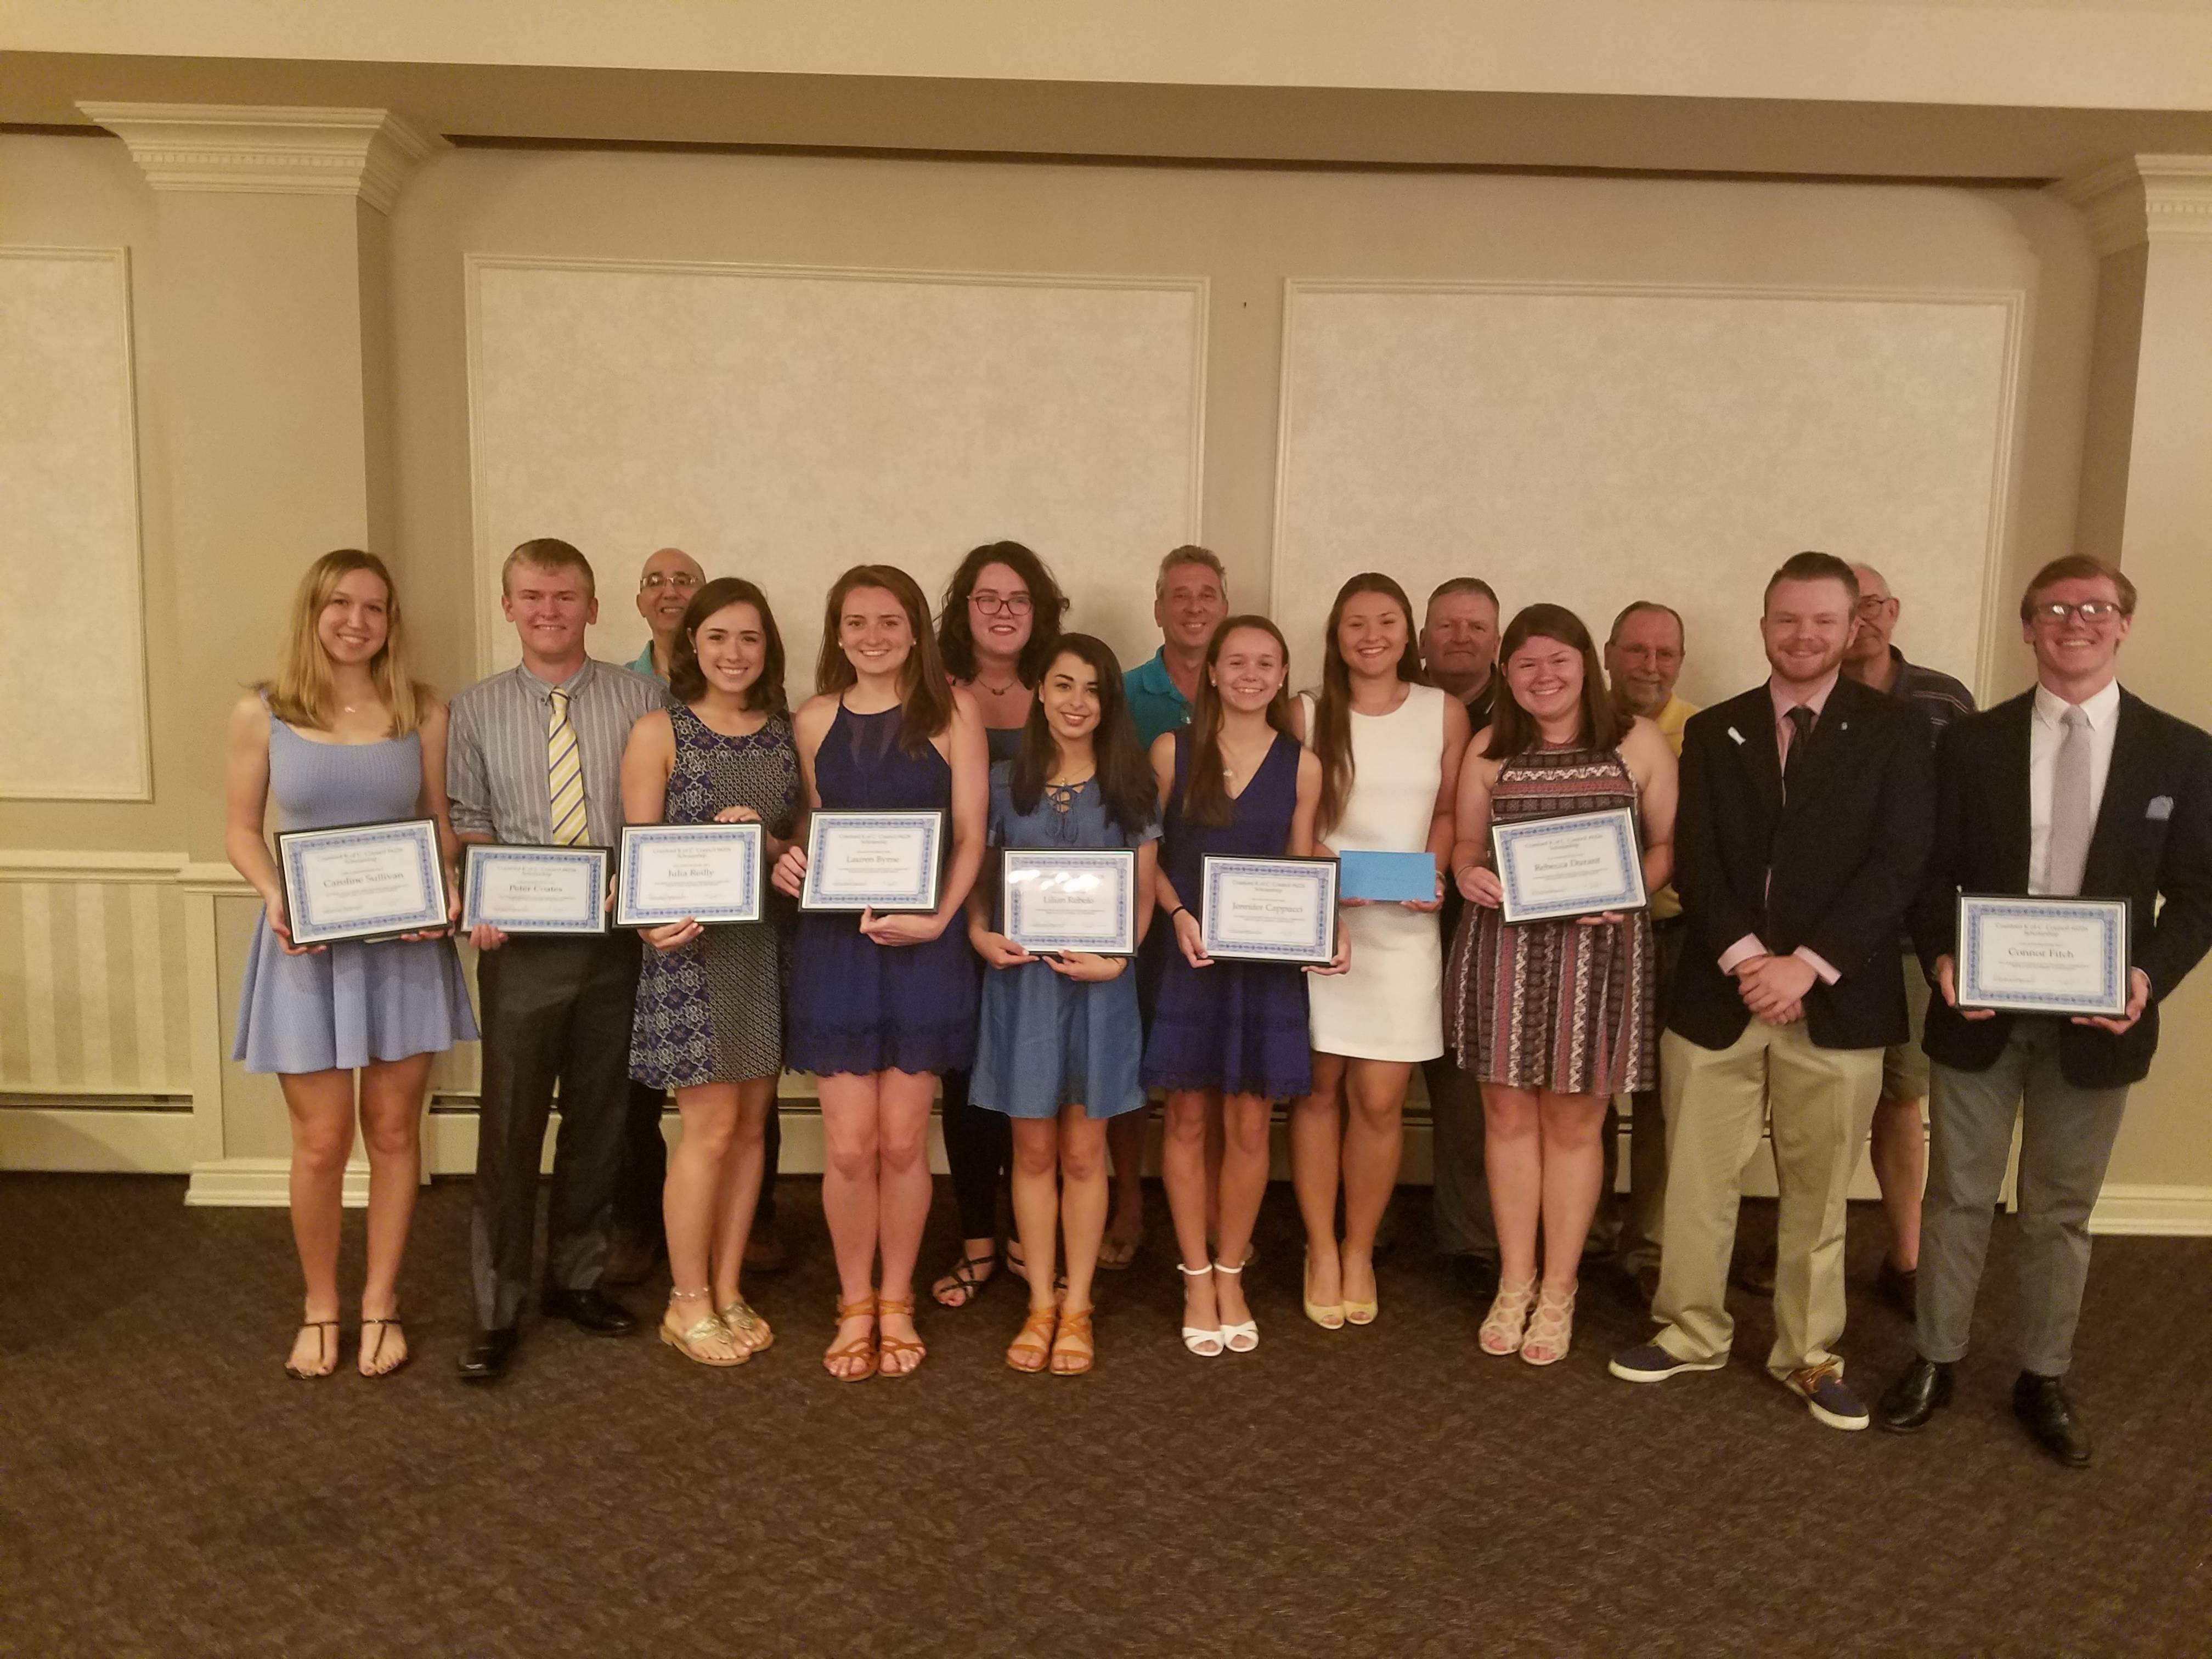 14a4f69adbeba1b74713_Cranford_K_of_C_2017_Scholarship_Winners.jpg